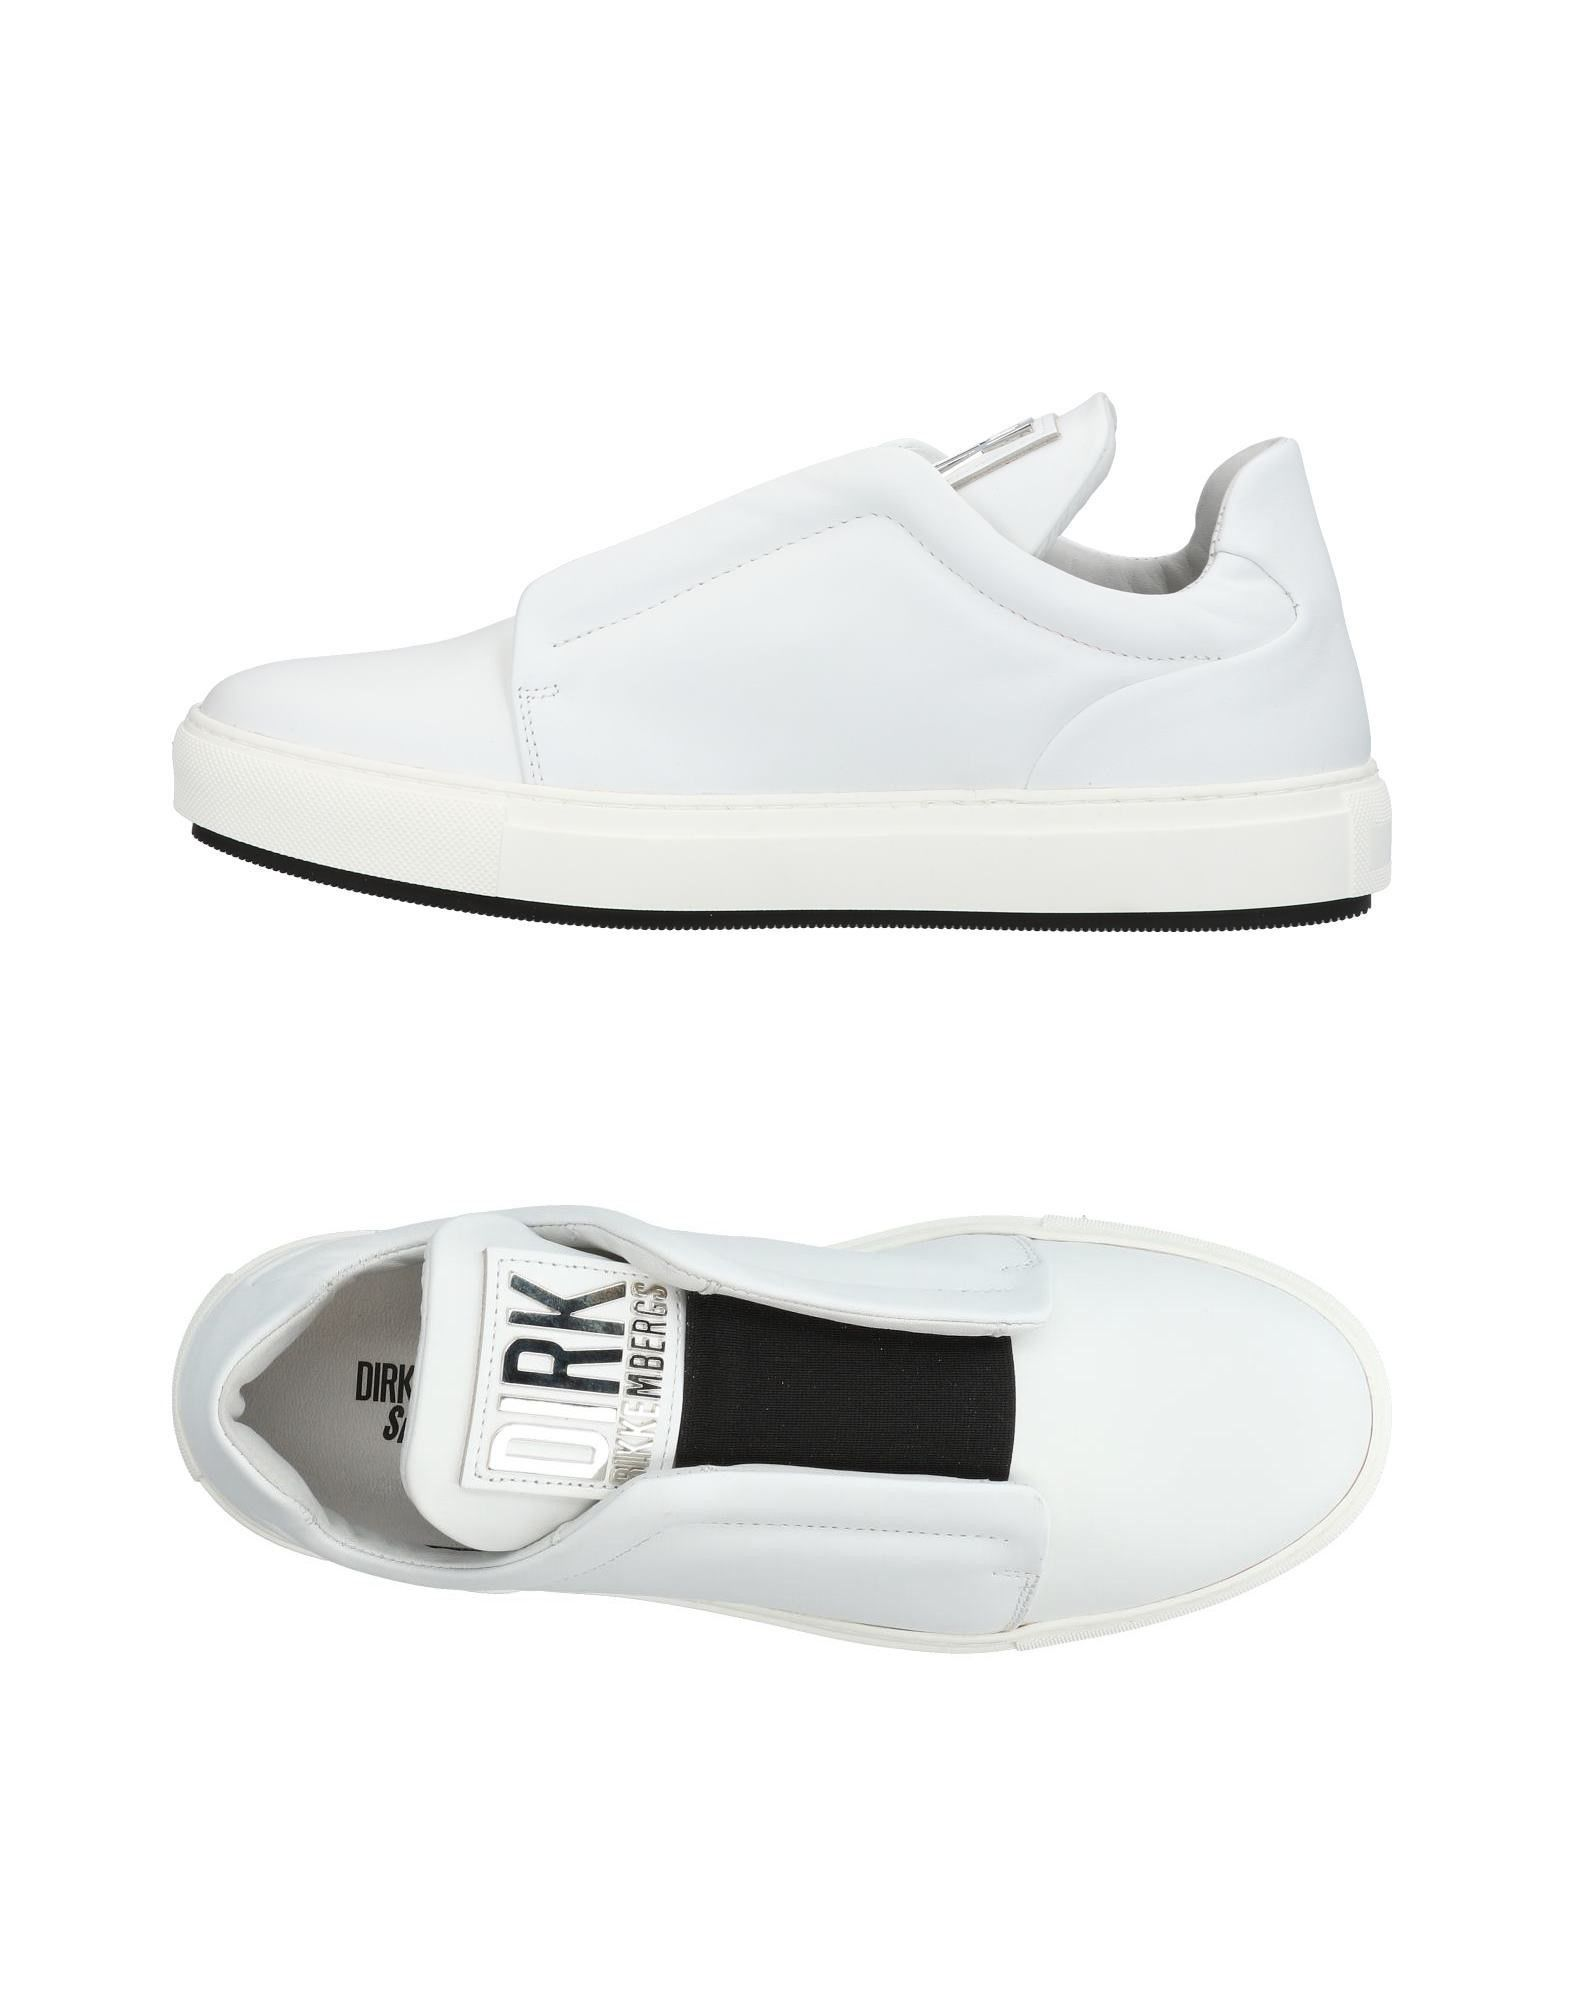 Sneakers Dirk Bikkembergs Uomo - 11418023XL